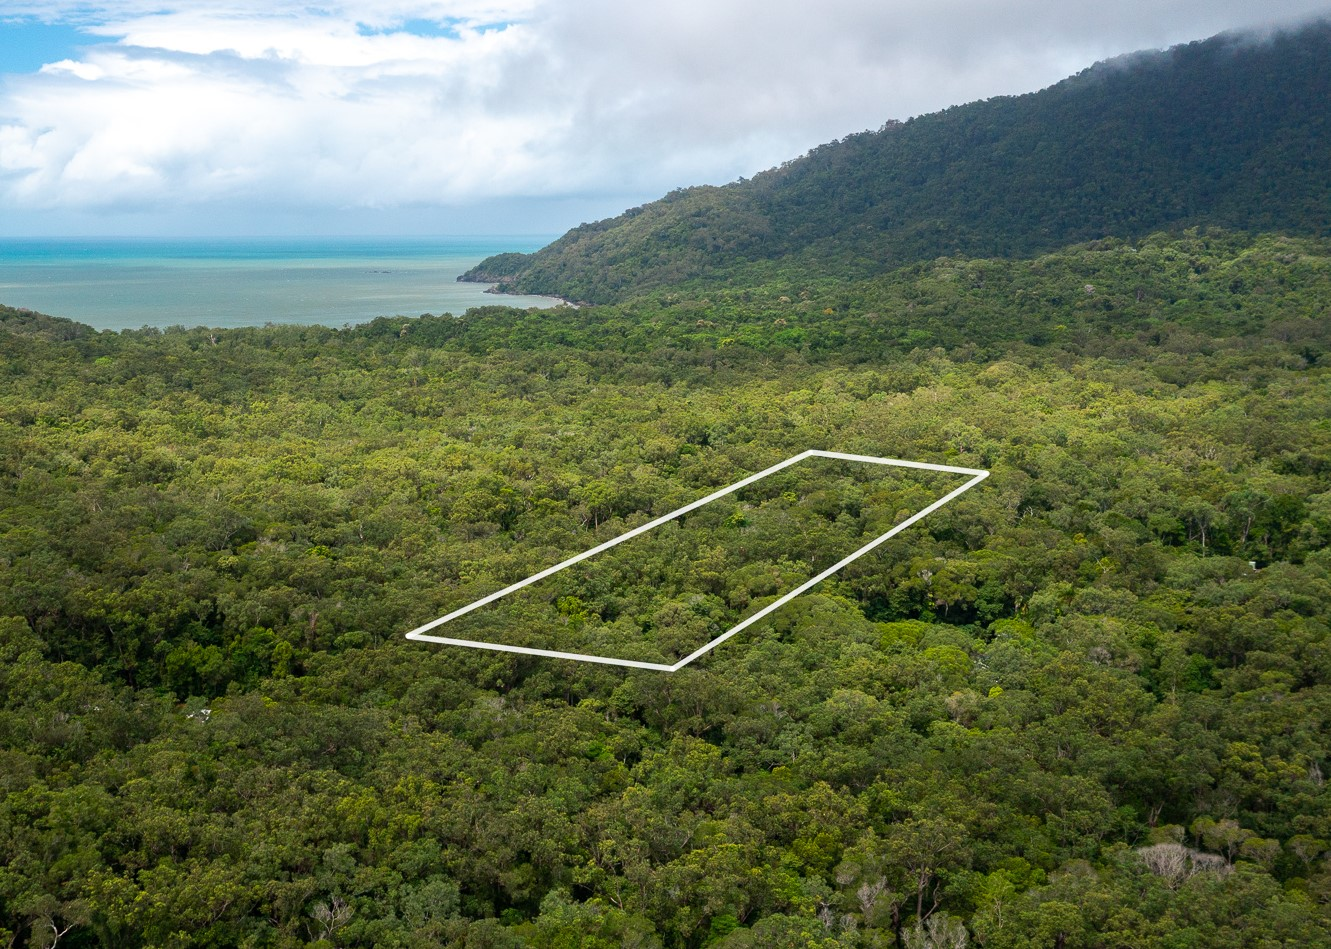 Lot 213 Teak Roadin the Daintree Lowland Rainforest